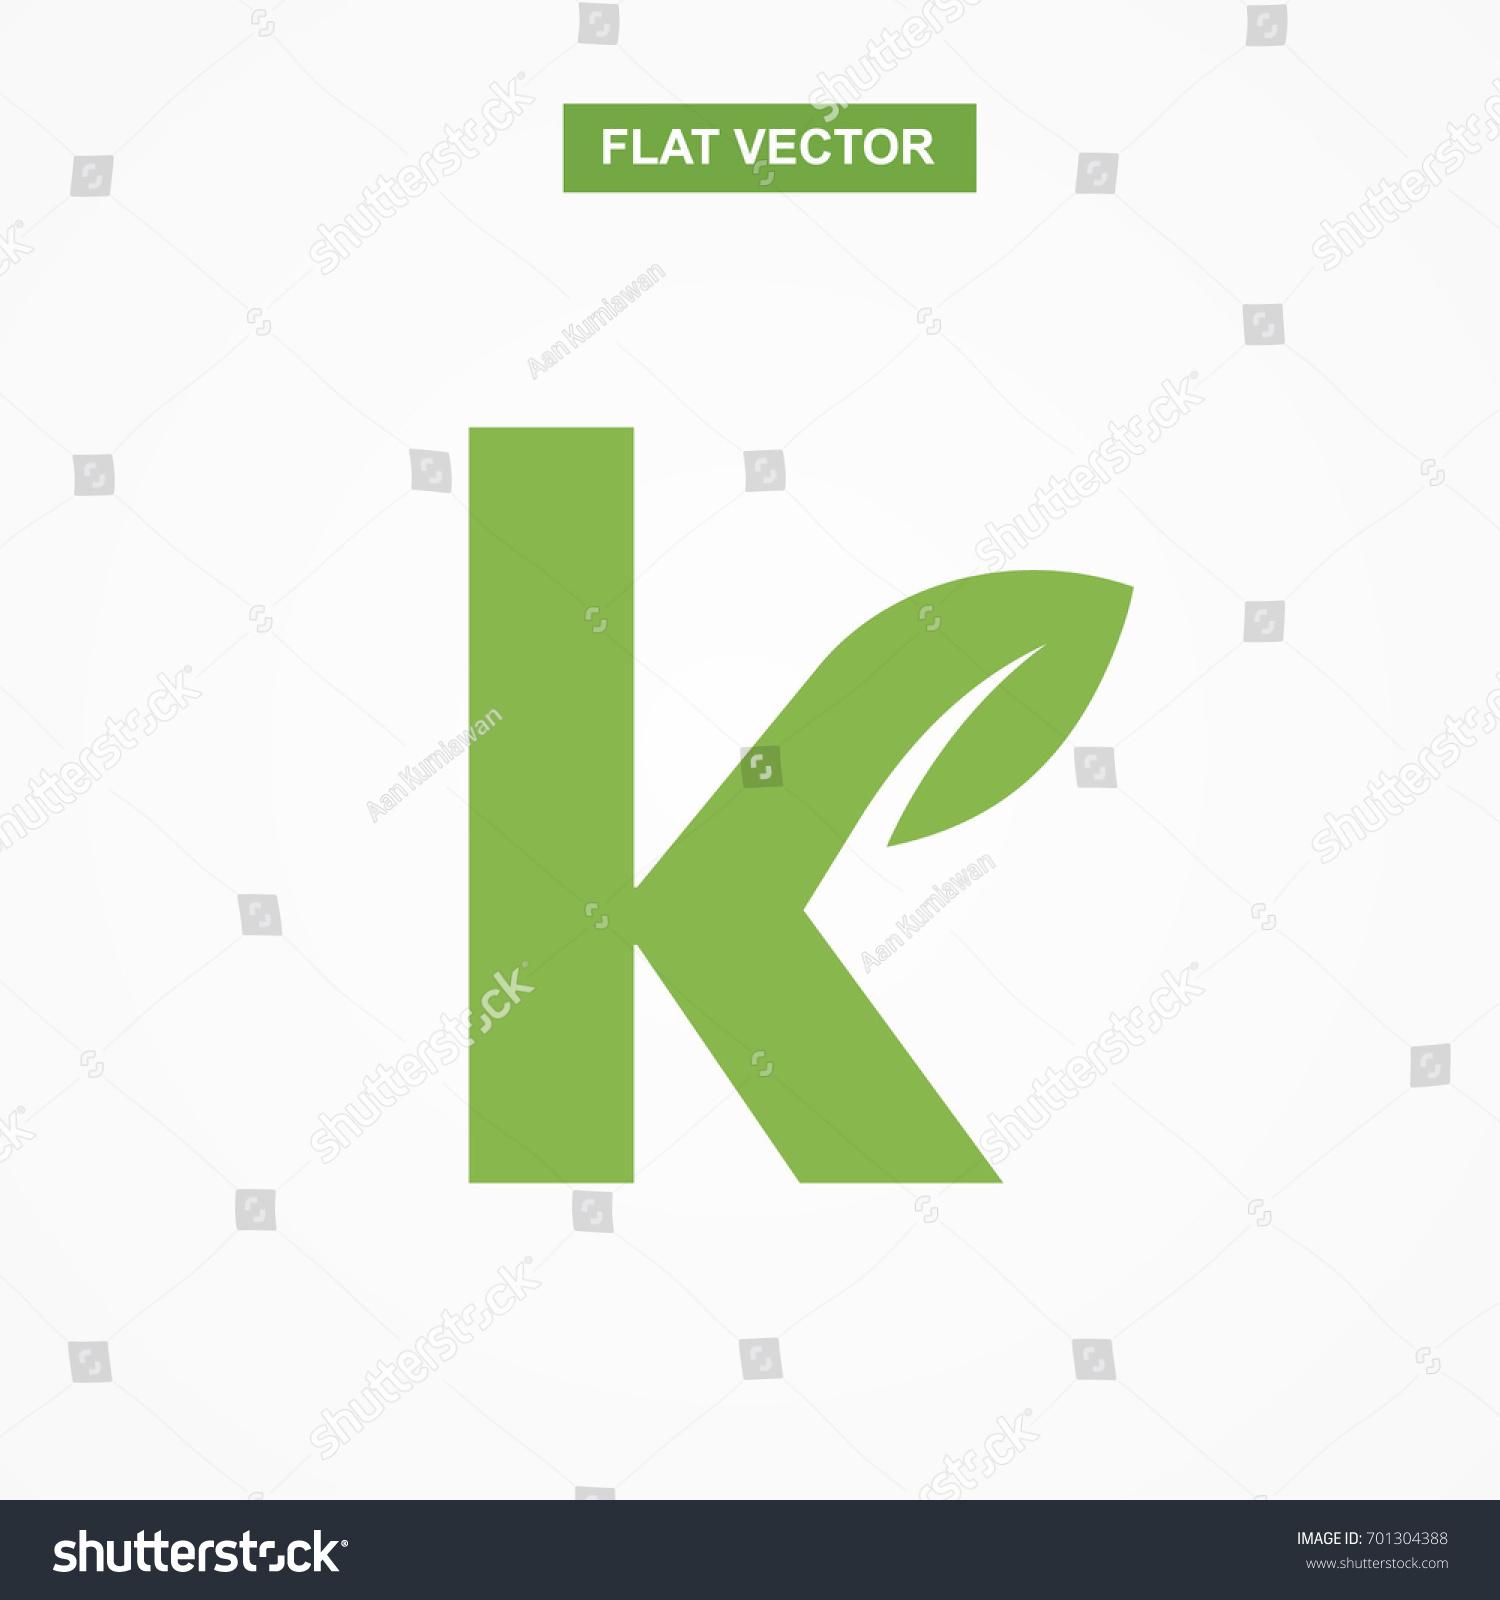 K letter font logo flat leaf stock vector 701304388 shutterstock k letter font logo flat with leaf vector logo template biocorpaavc Gallery